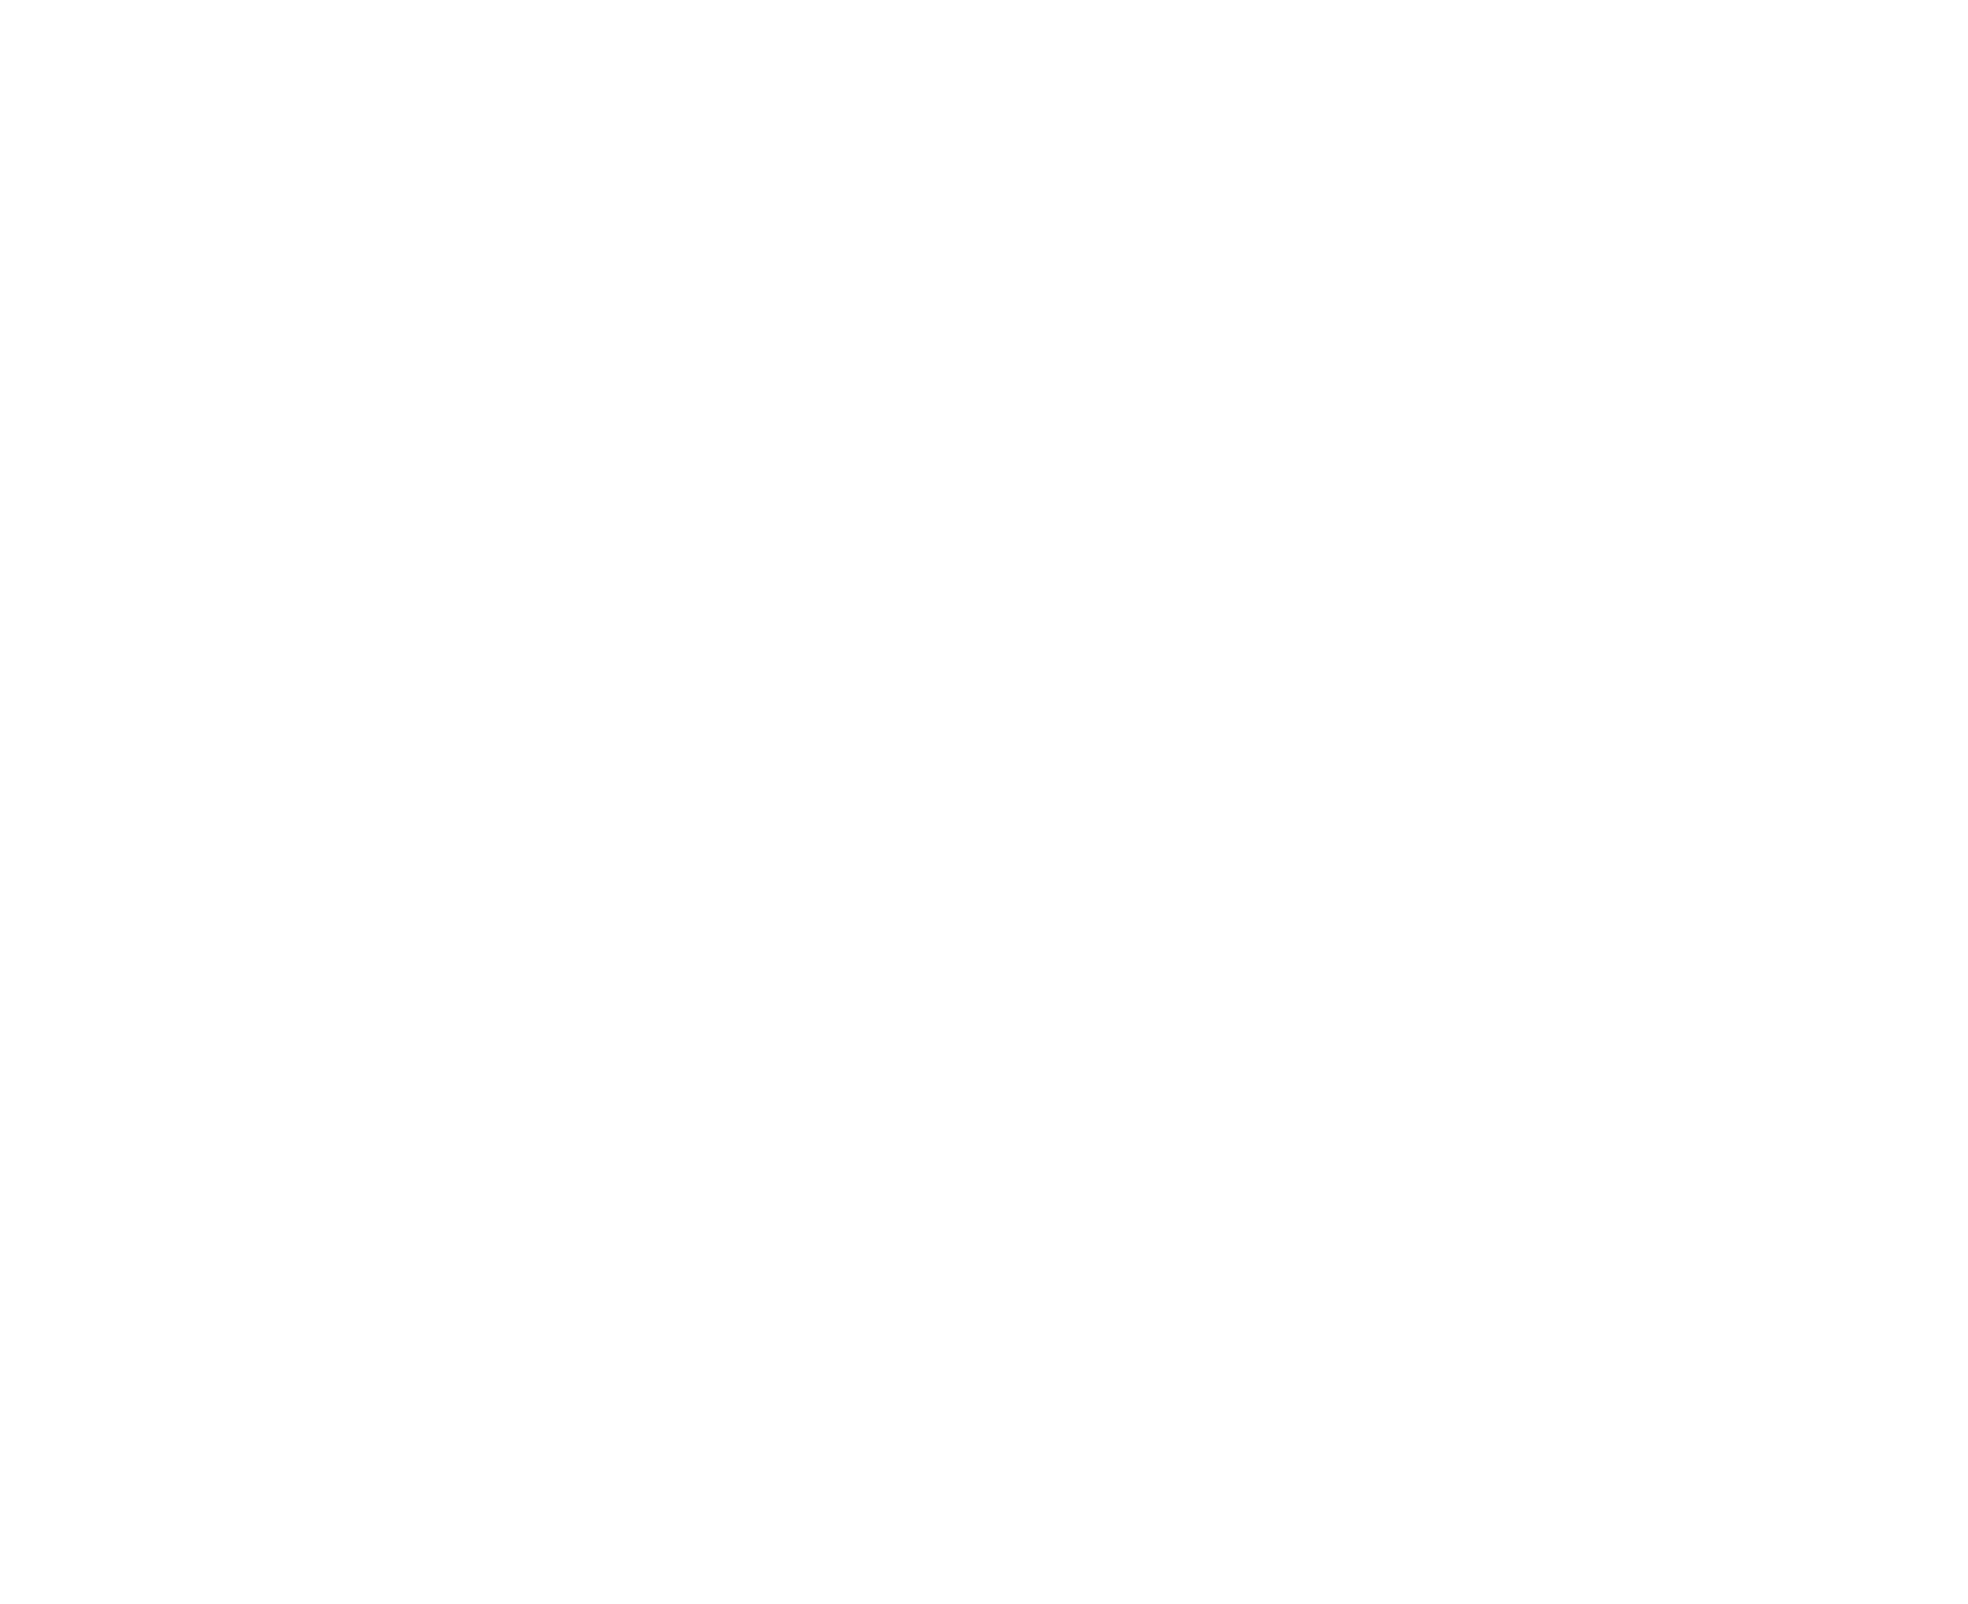 JN_PRESERVATION-ROBOT-01